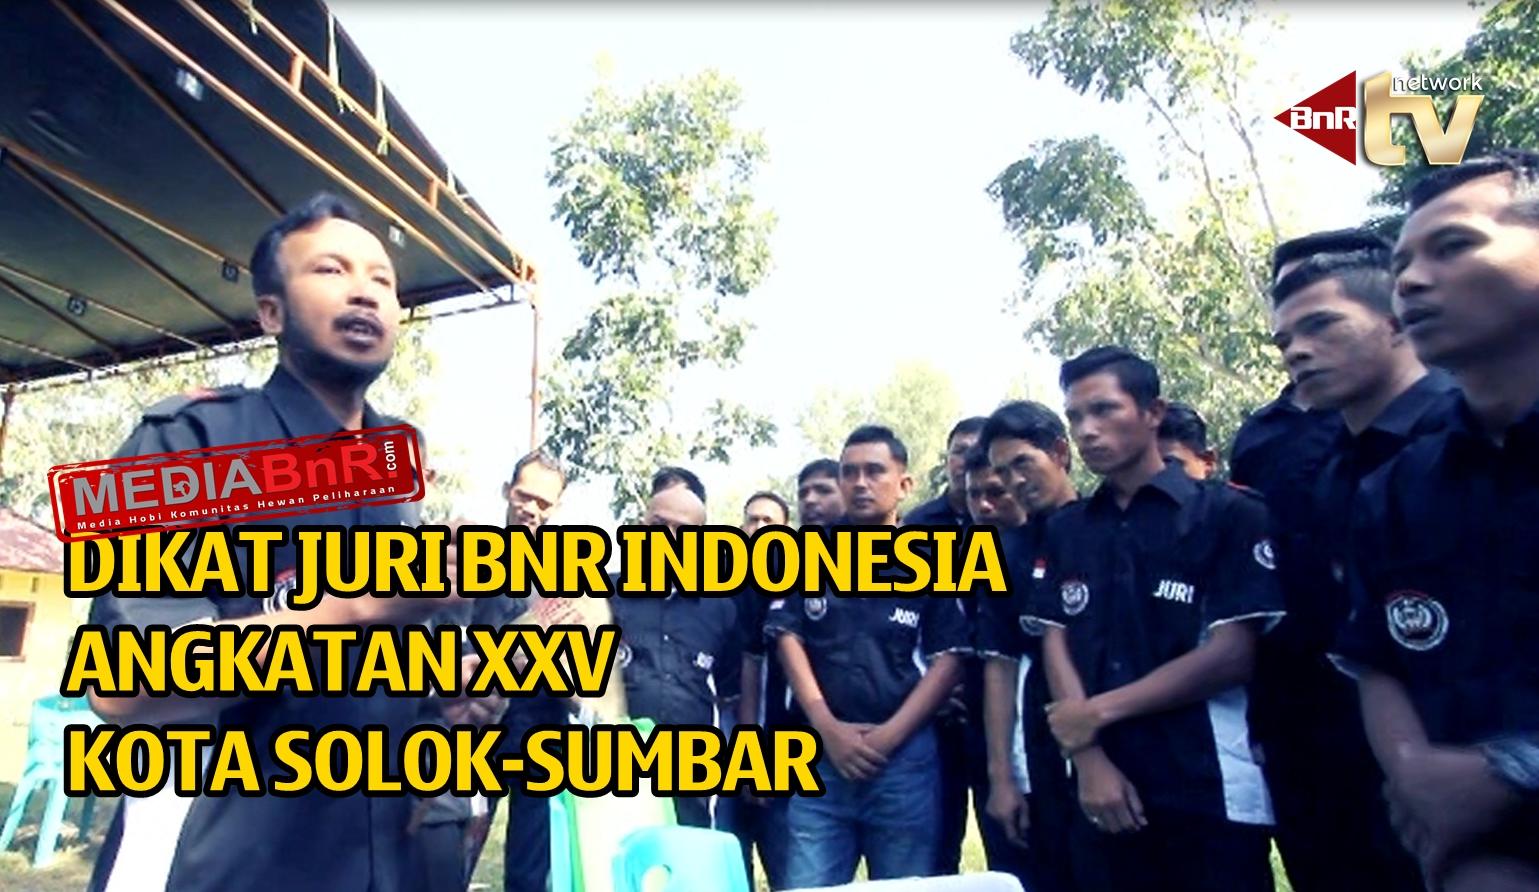 Diklat Juri BnR Indonesia Angkatan XXV, Kota Solok-Sumbar (Video)